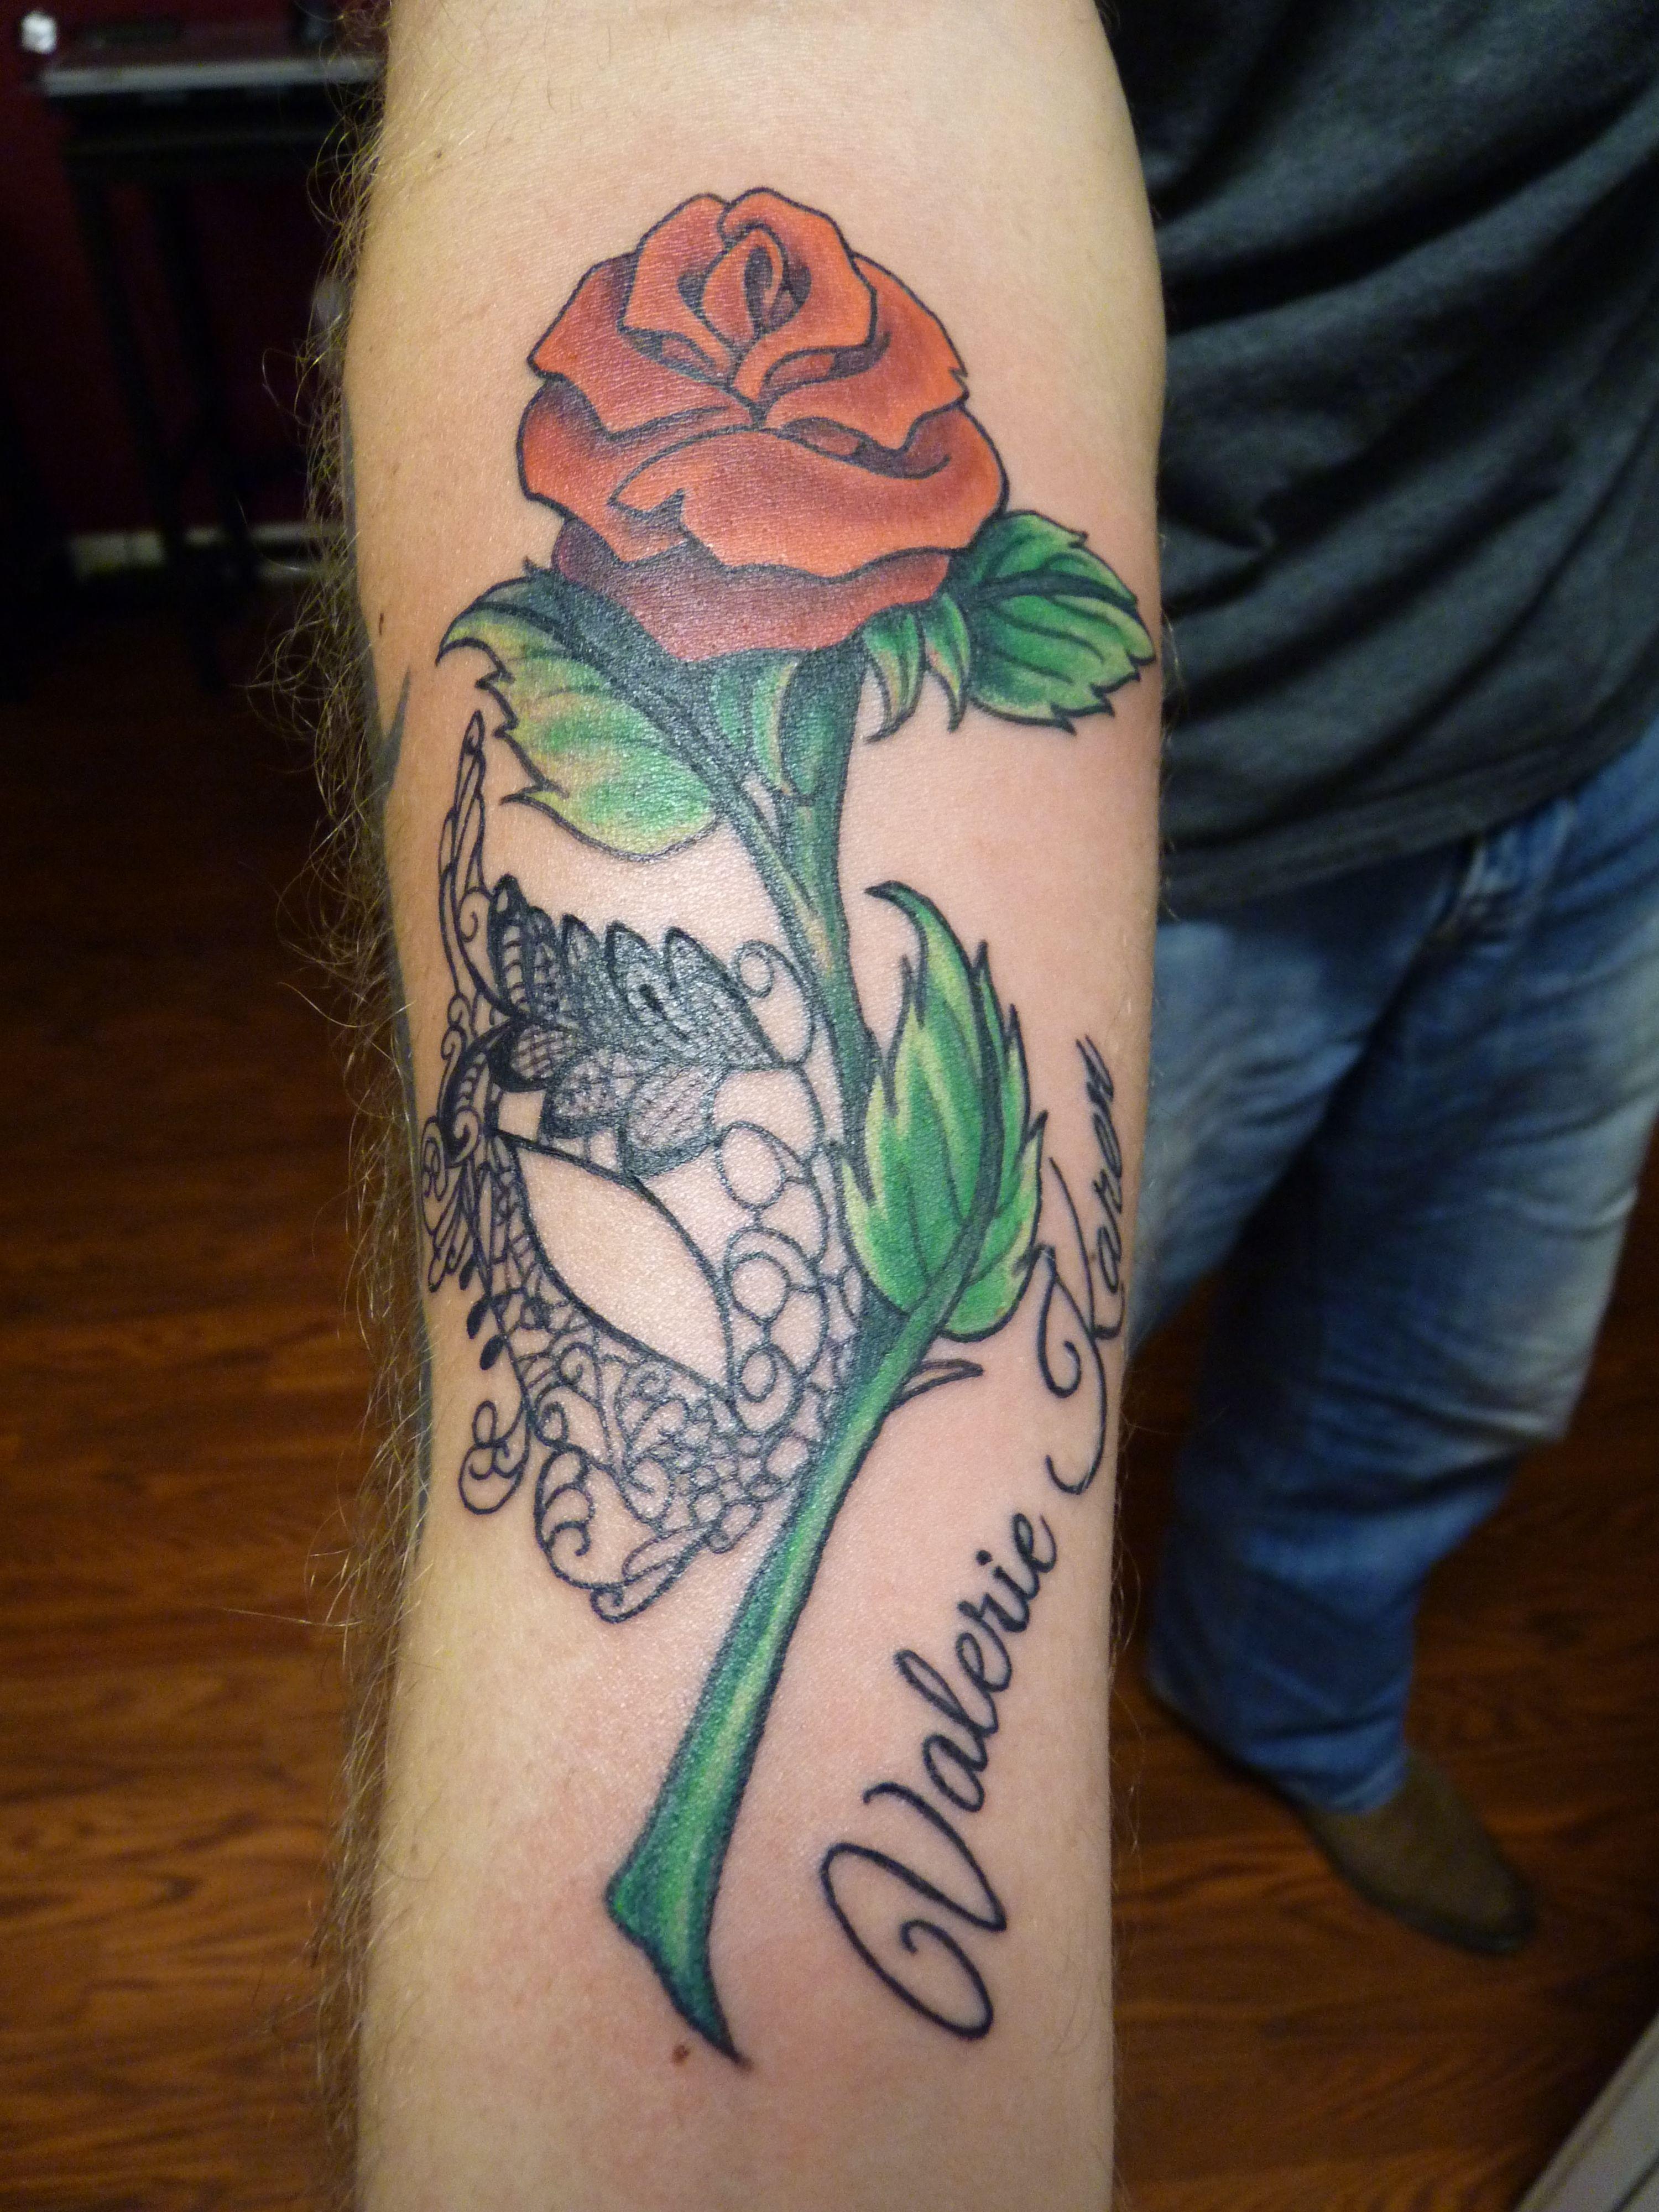 White Ink Tattoo Lace Fededcedbdff